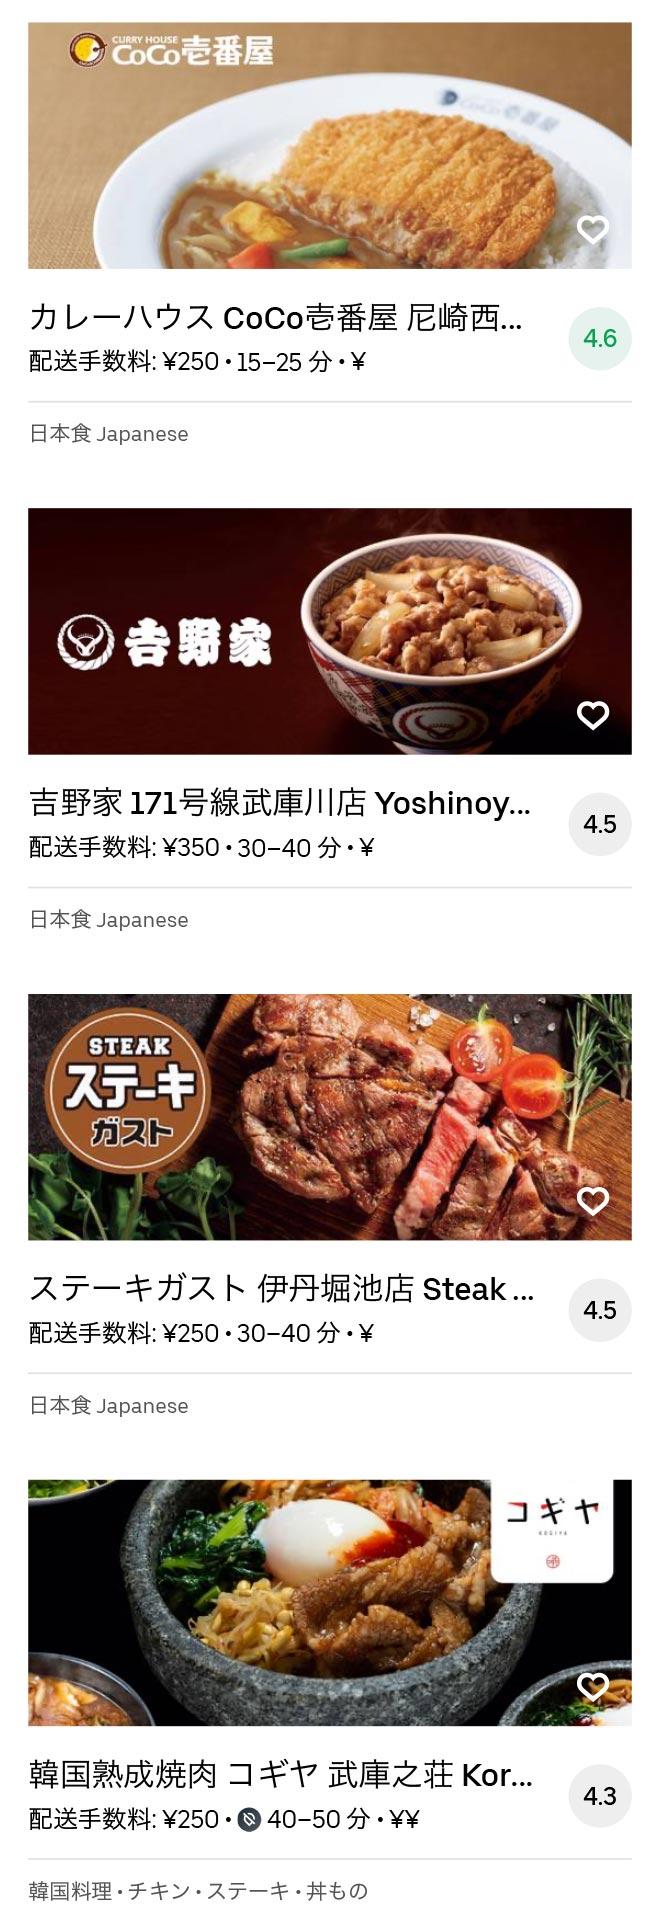 Itami sakuradai menu 2007 03